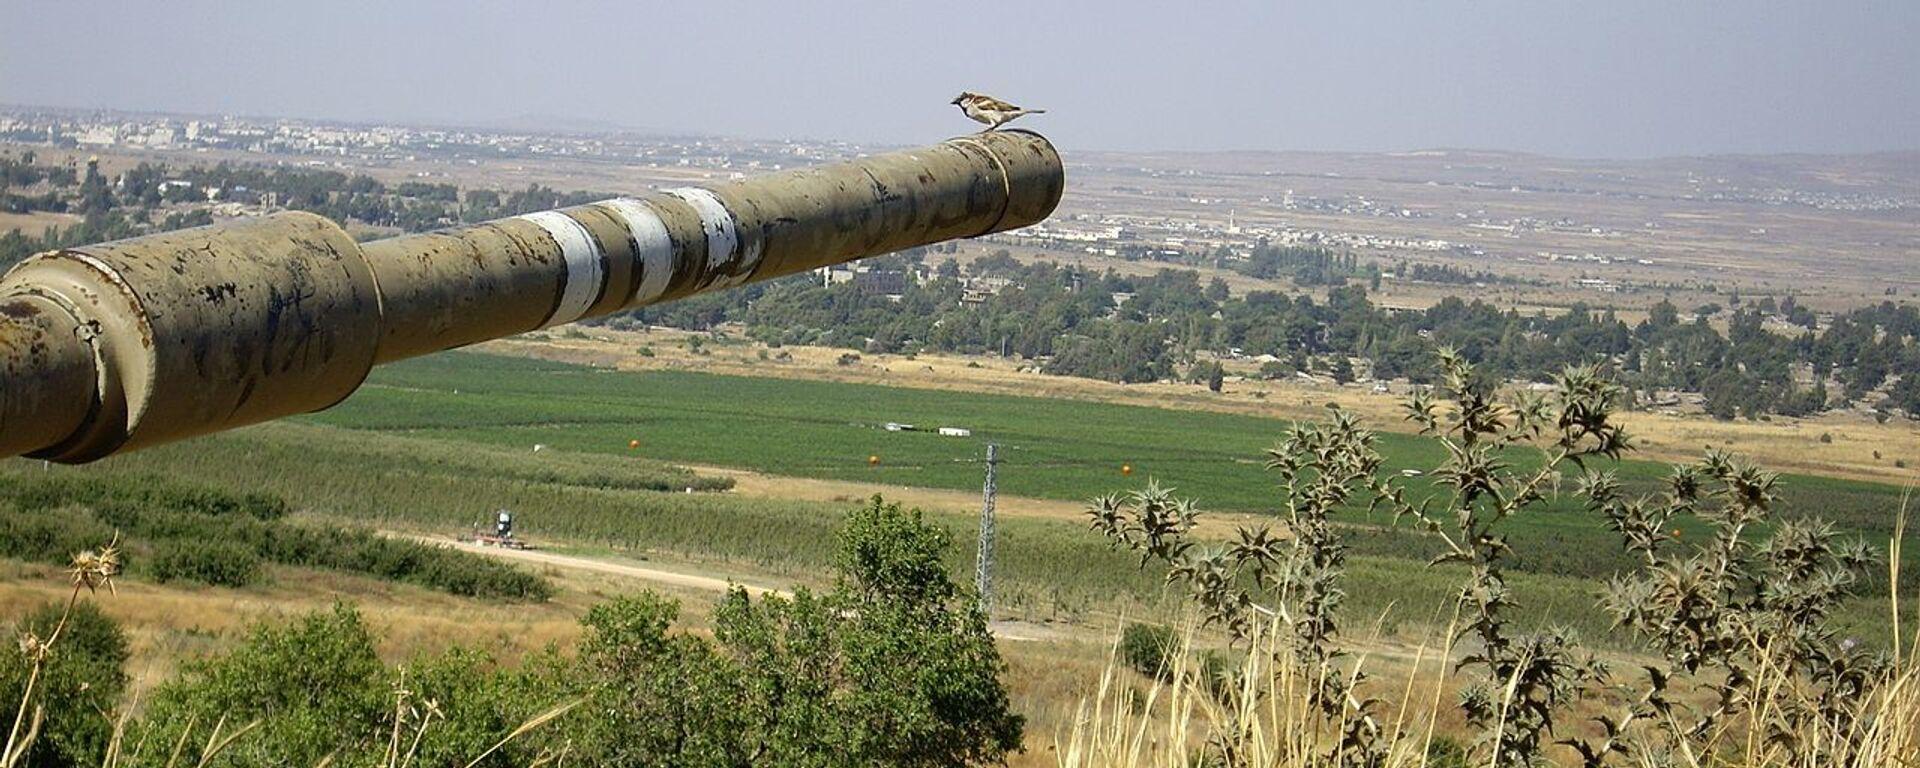 Israel-Syria border - Sputnik International, 1920, 17.08.2021